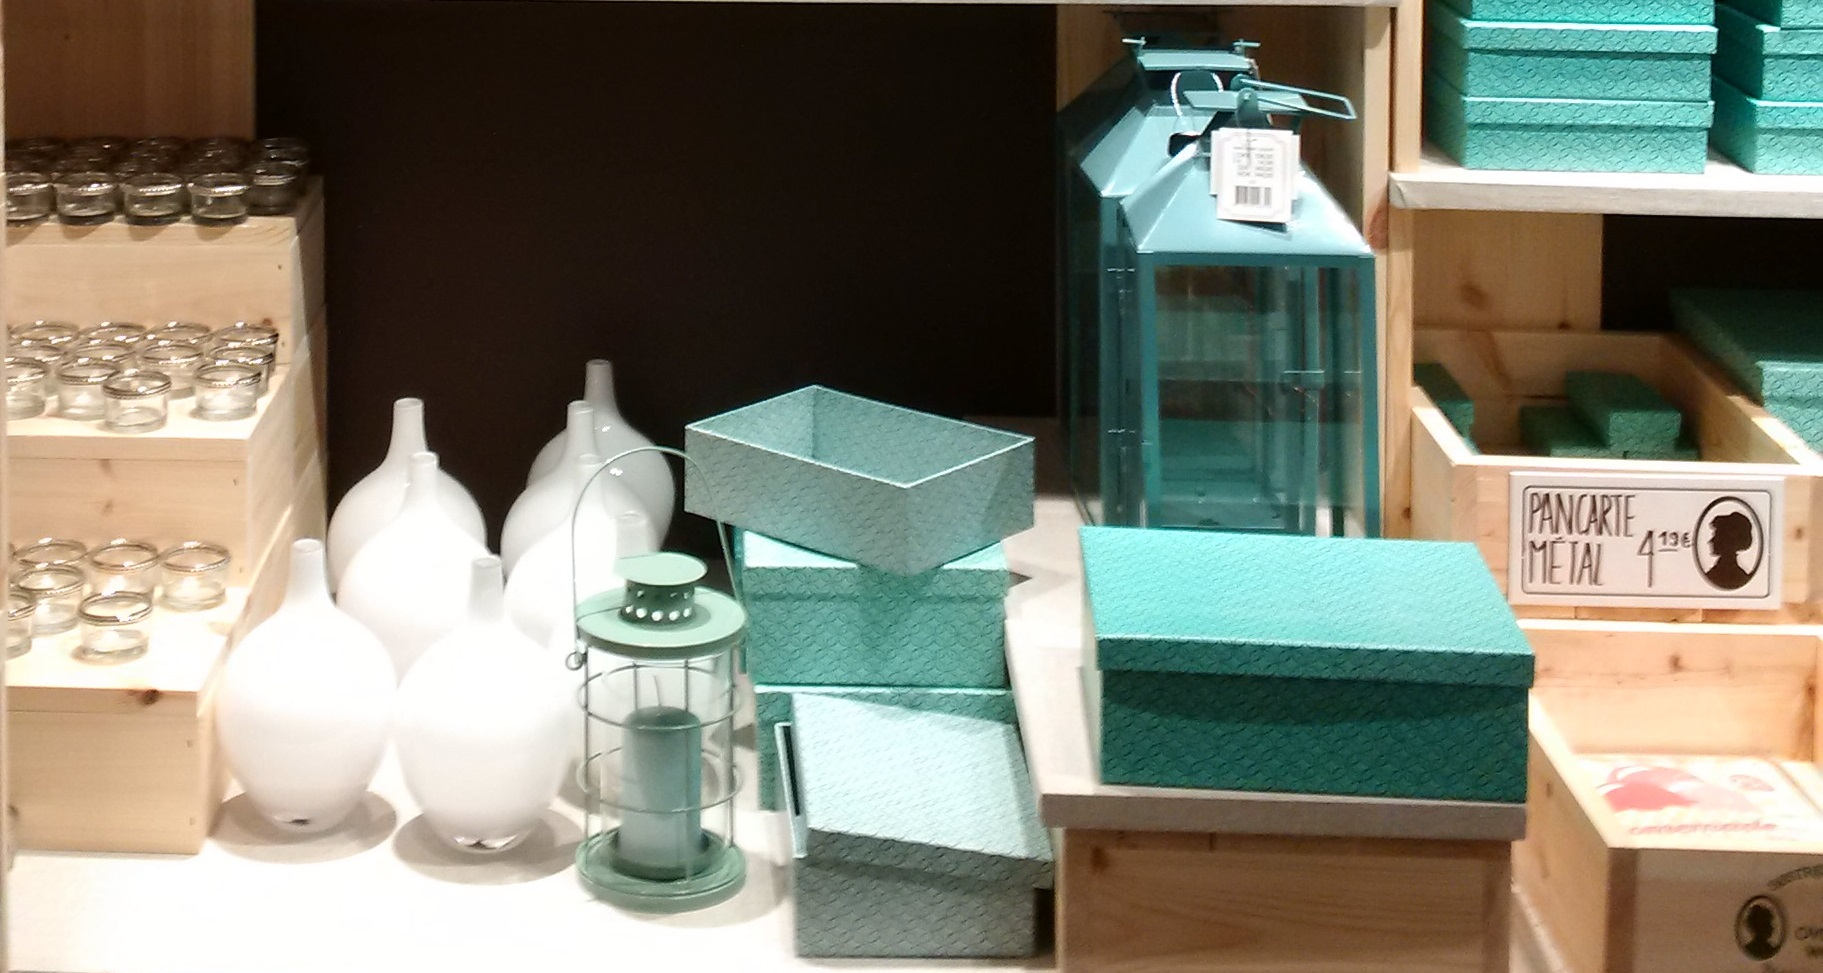 le marketing exp rientiel et sensoriel de s strene grenes. Black Bedroom Furniture Sets. Home Design Ideas